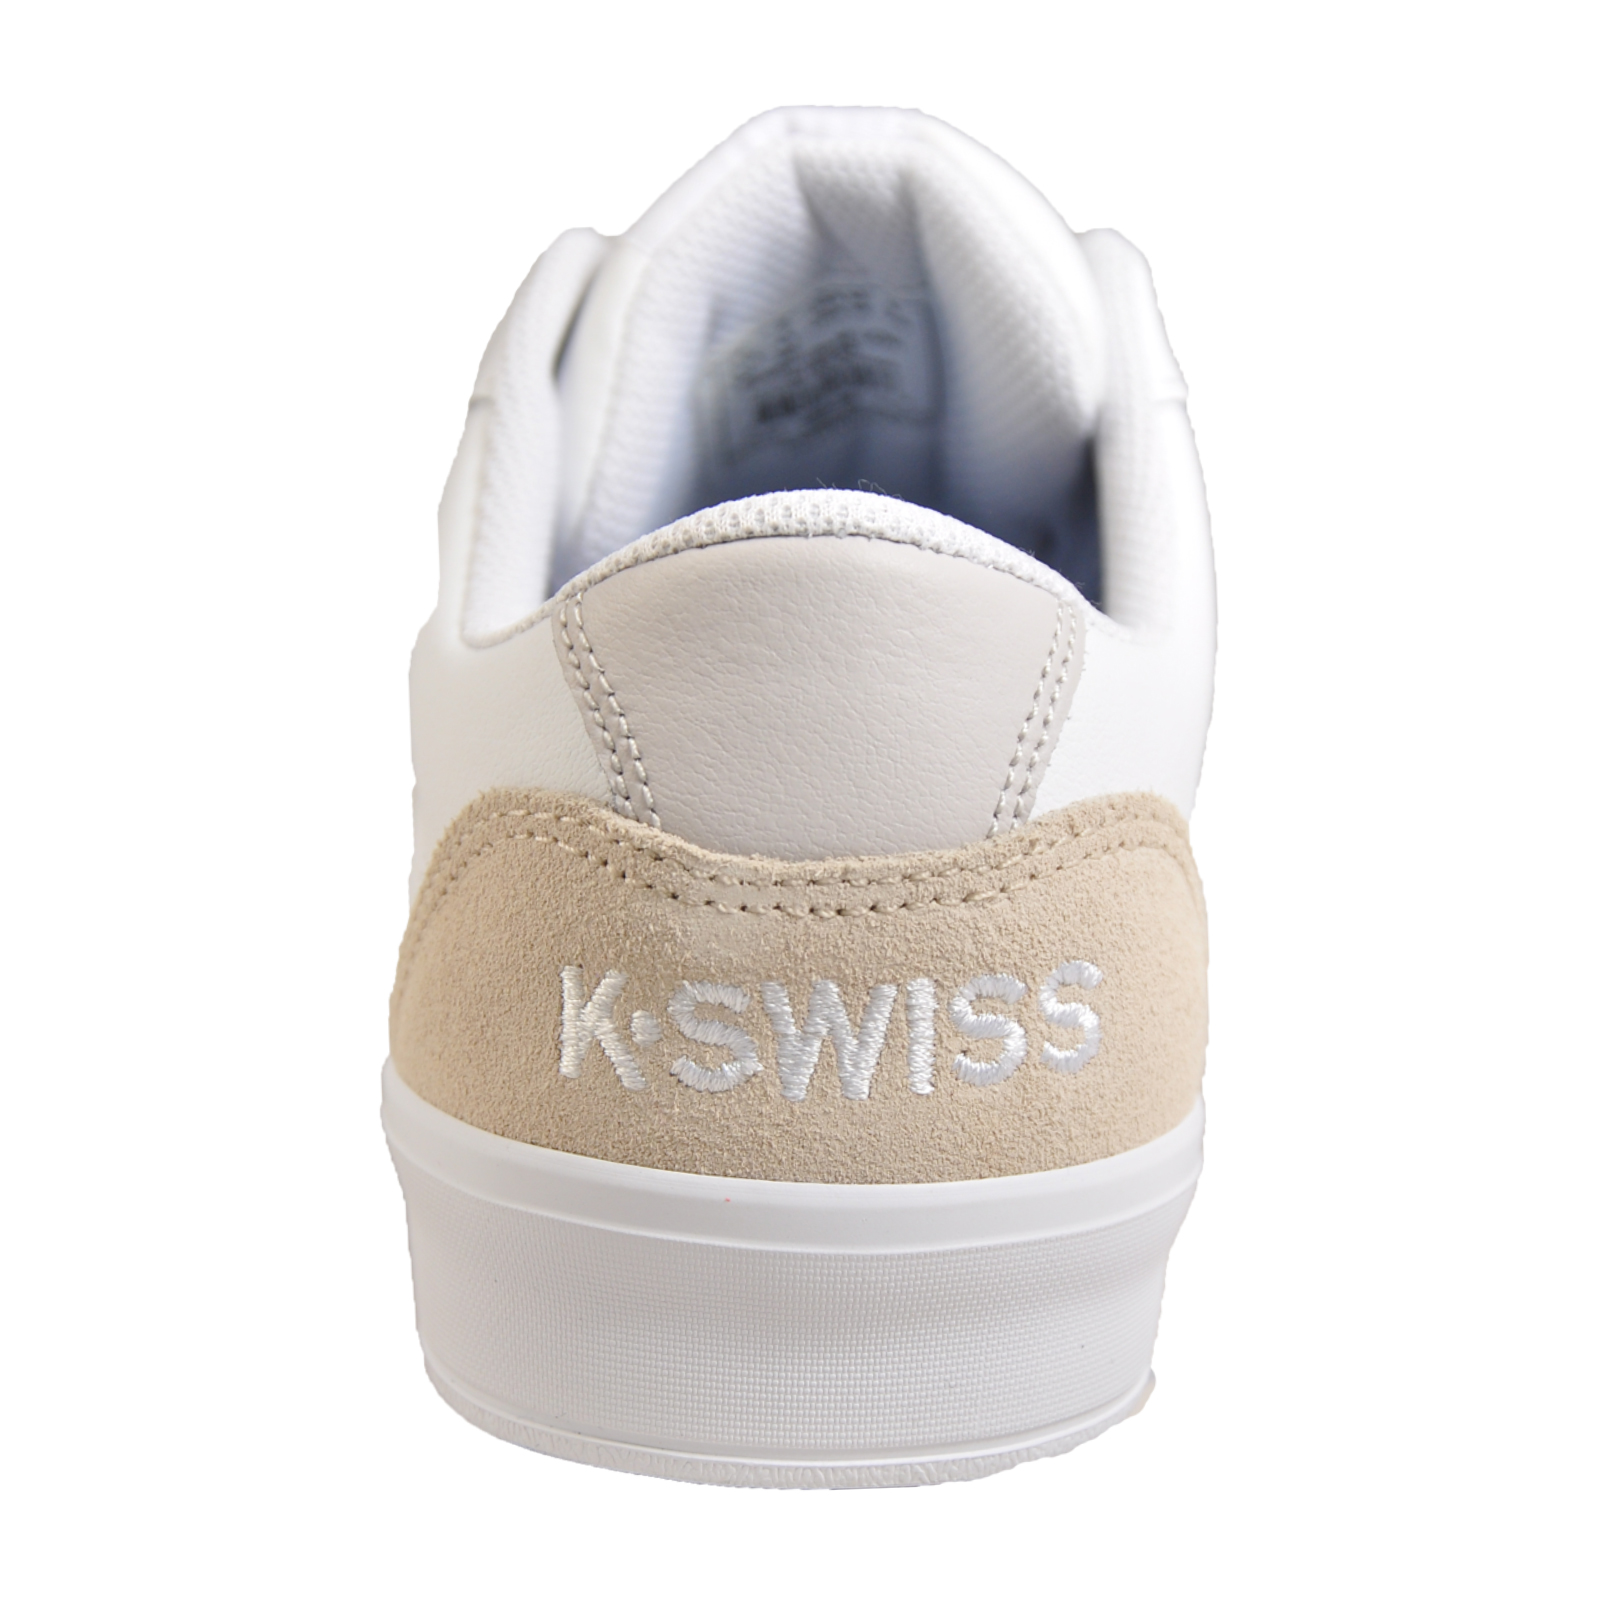 dfc0f6fe70a39 K Swiss Addison Vulc Men s Leather Court Fashion Trainers White